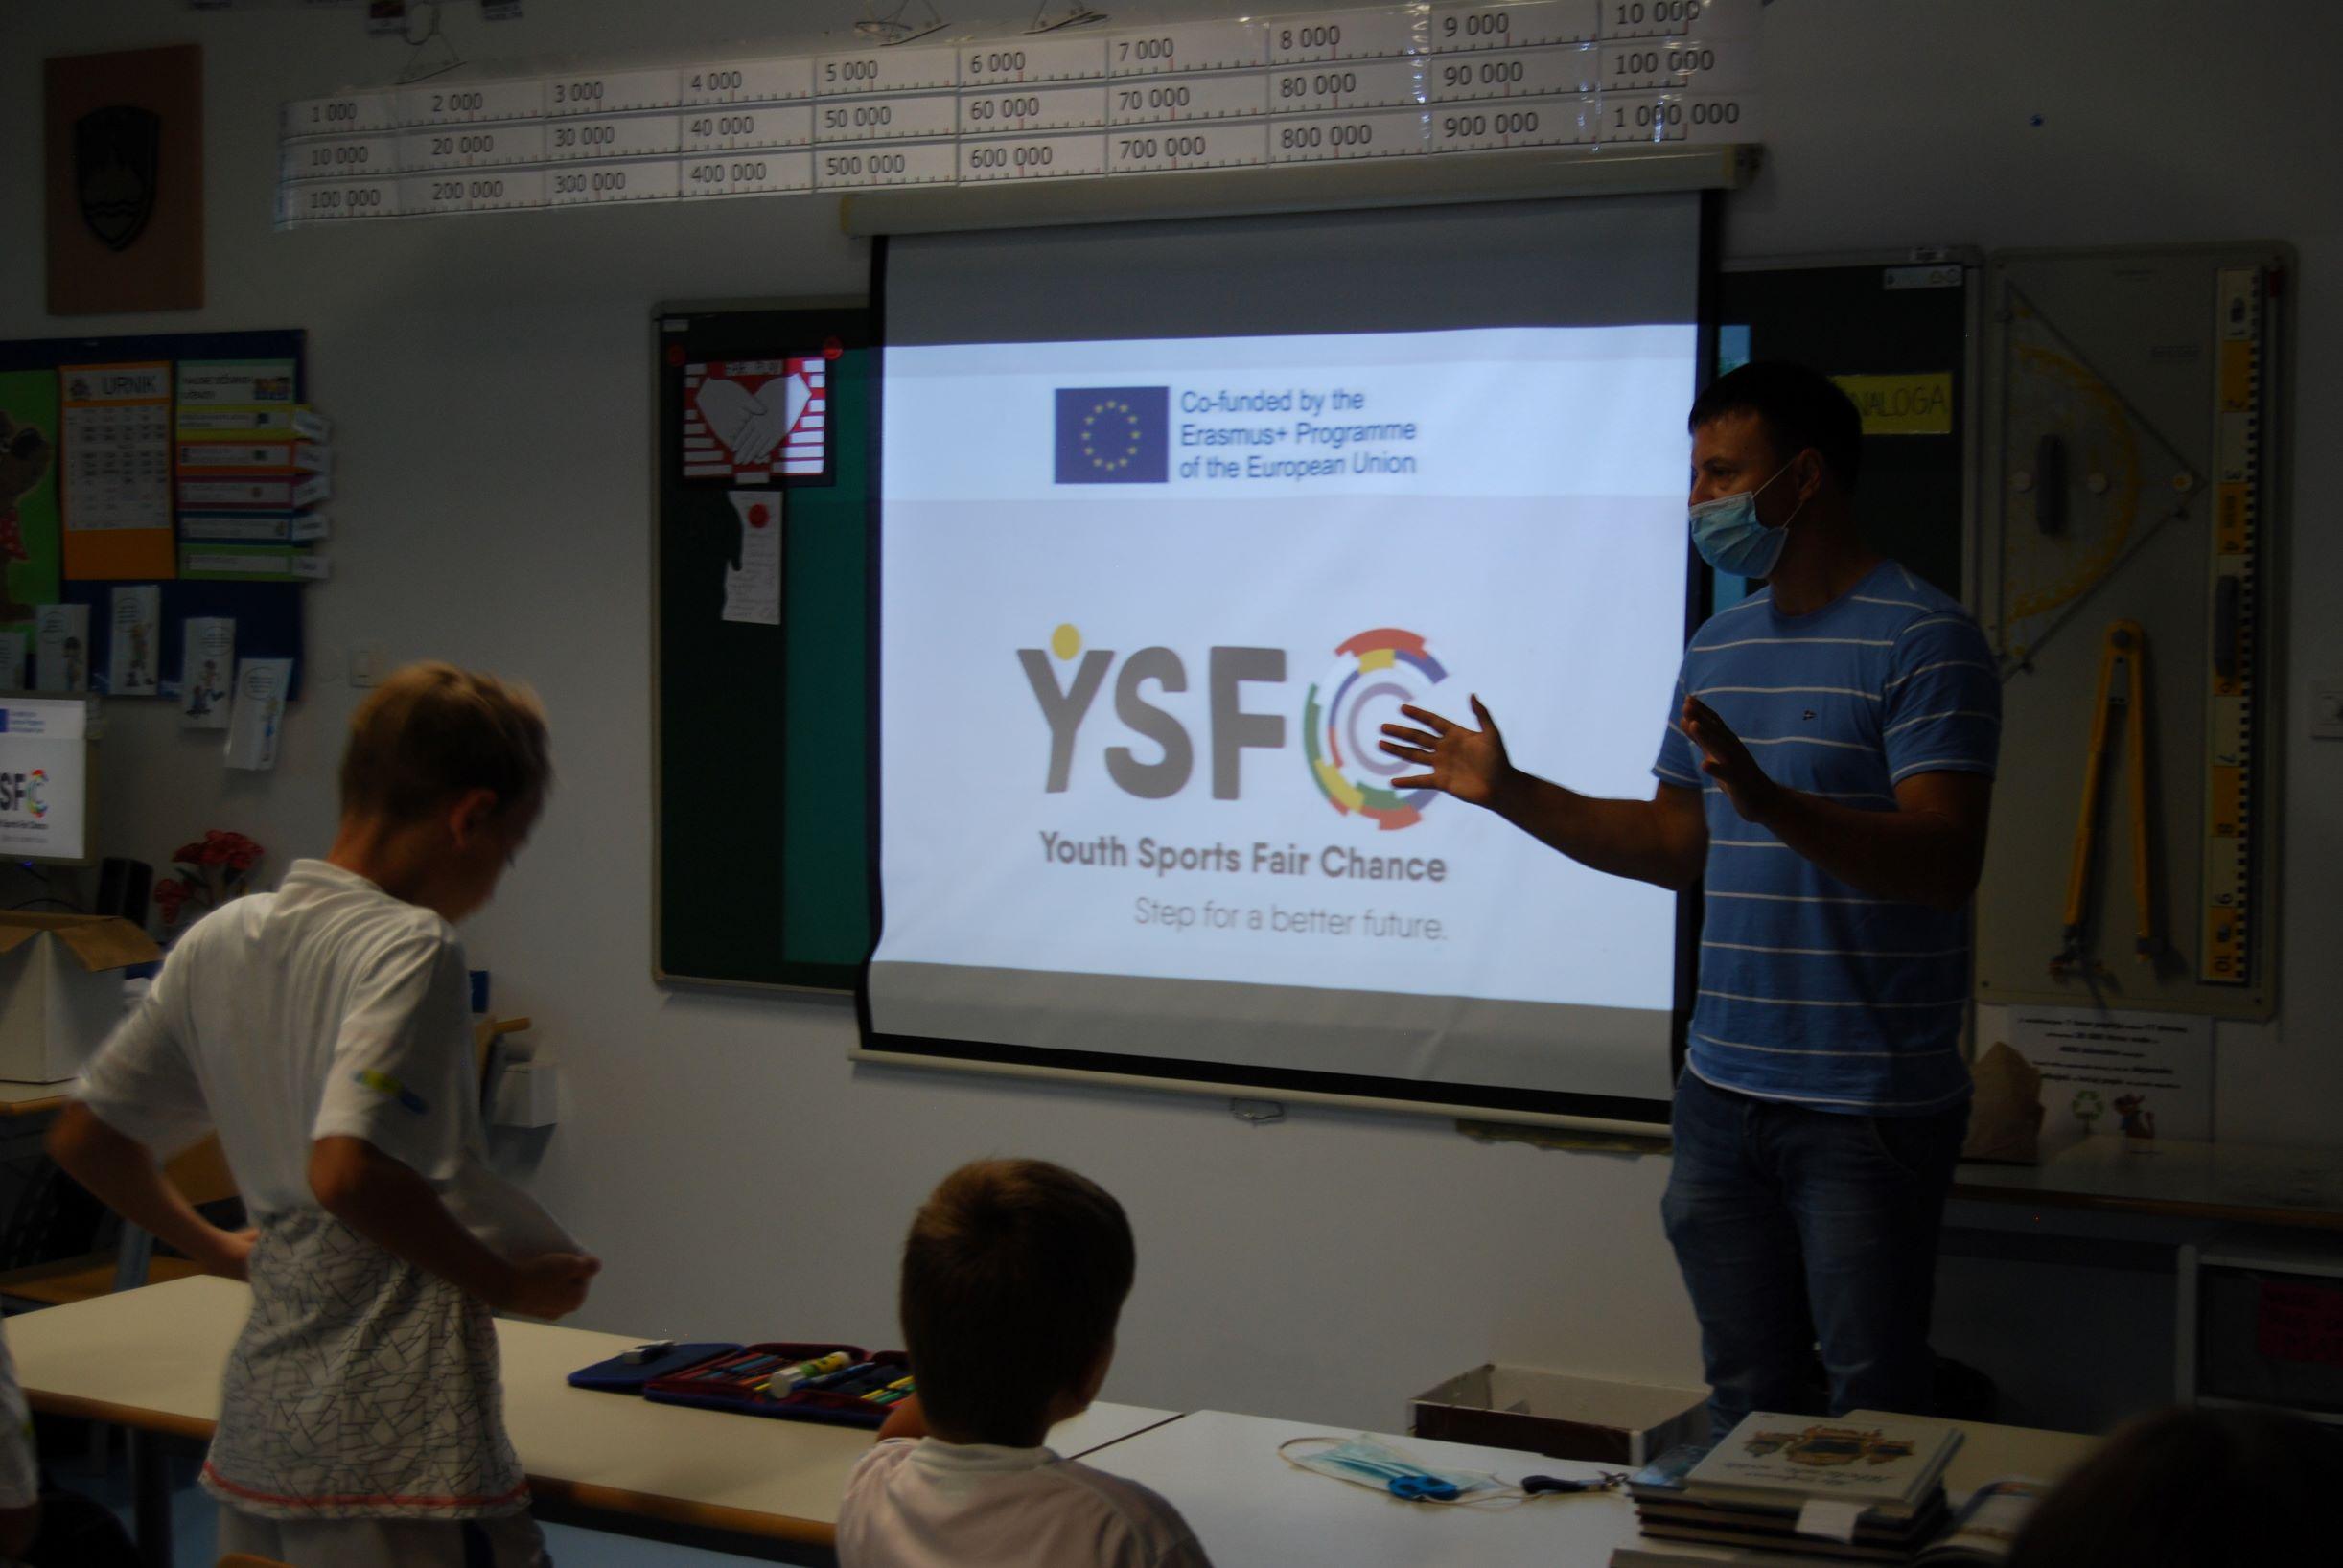 ysfc-6